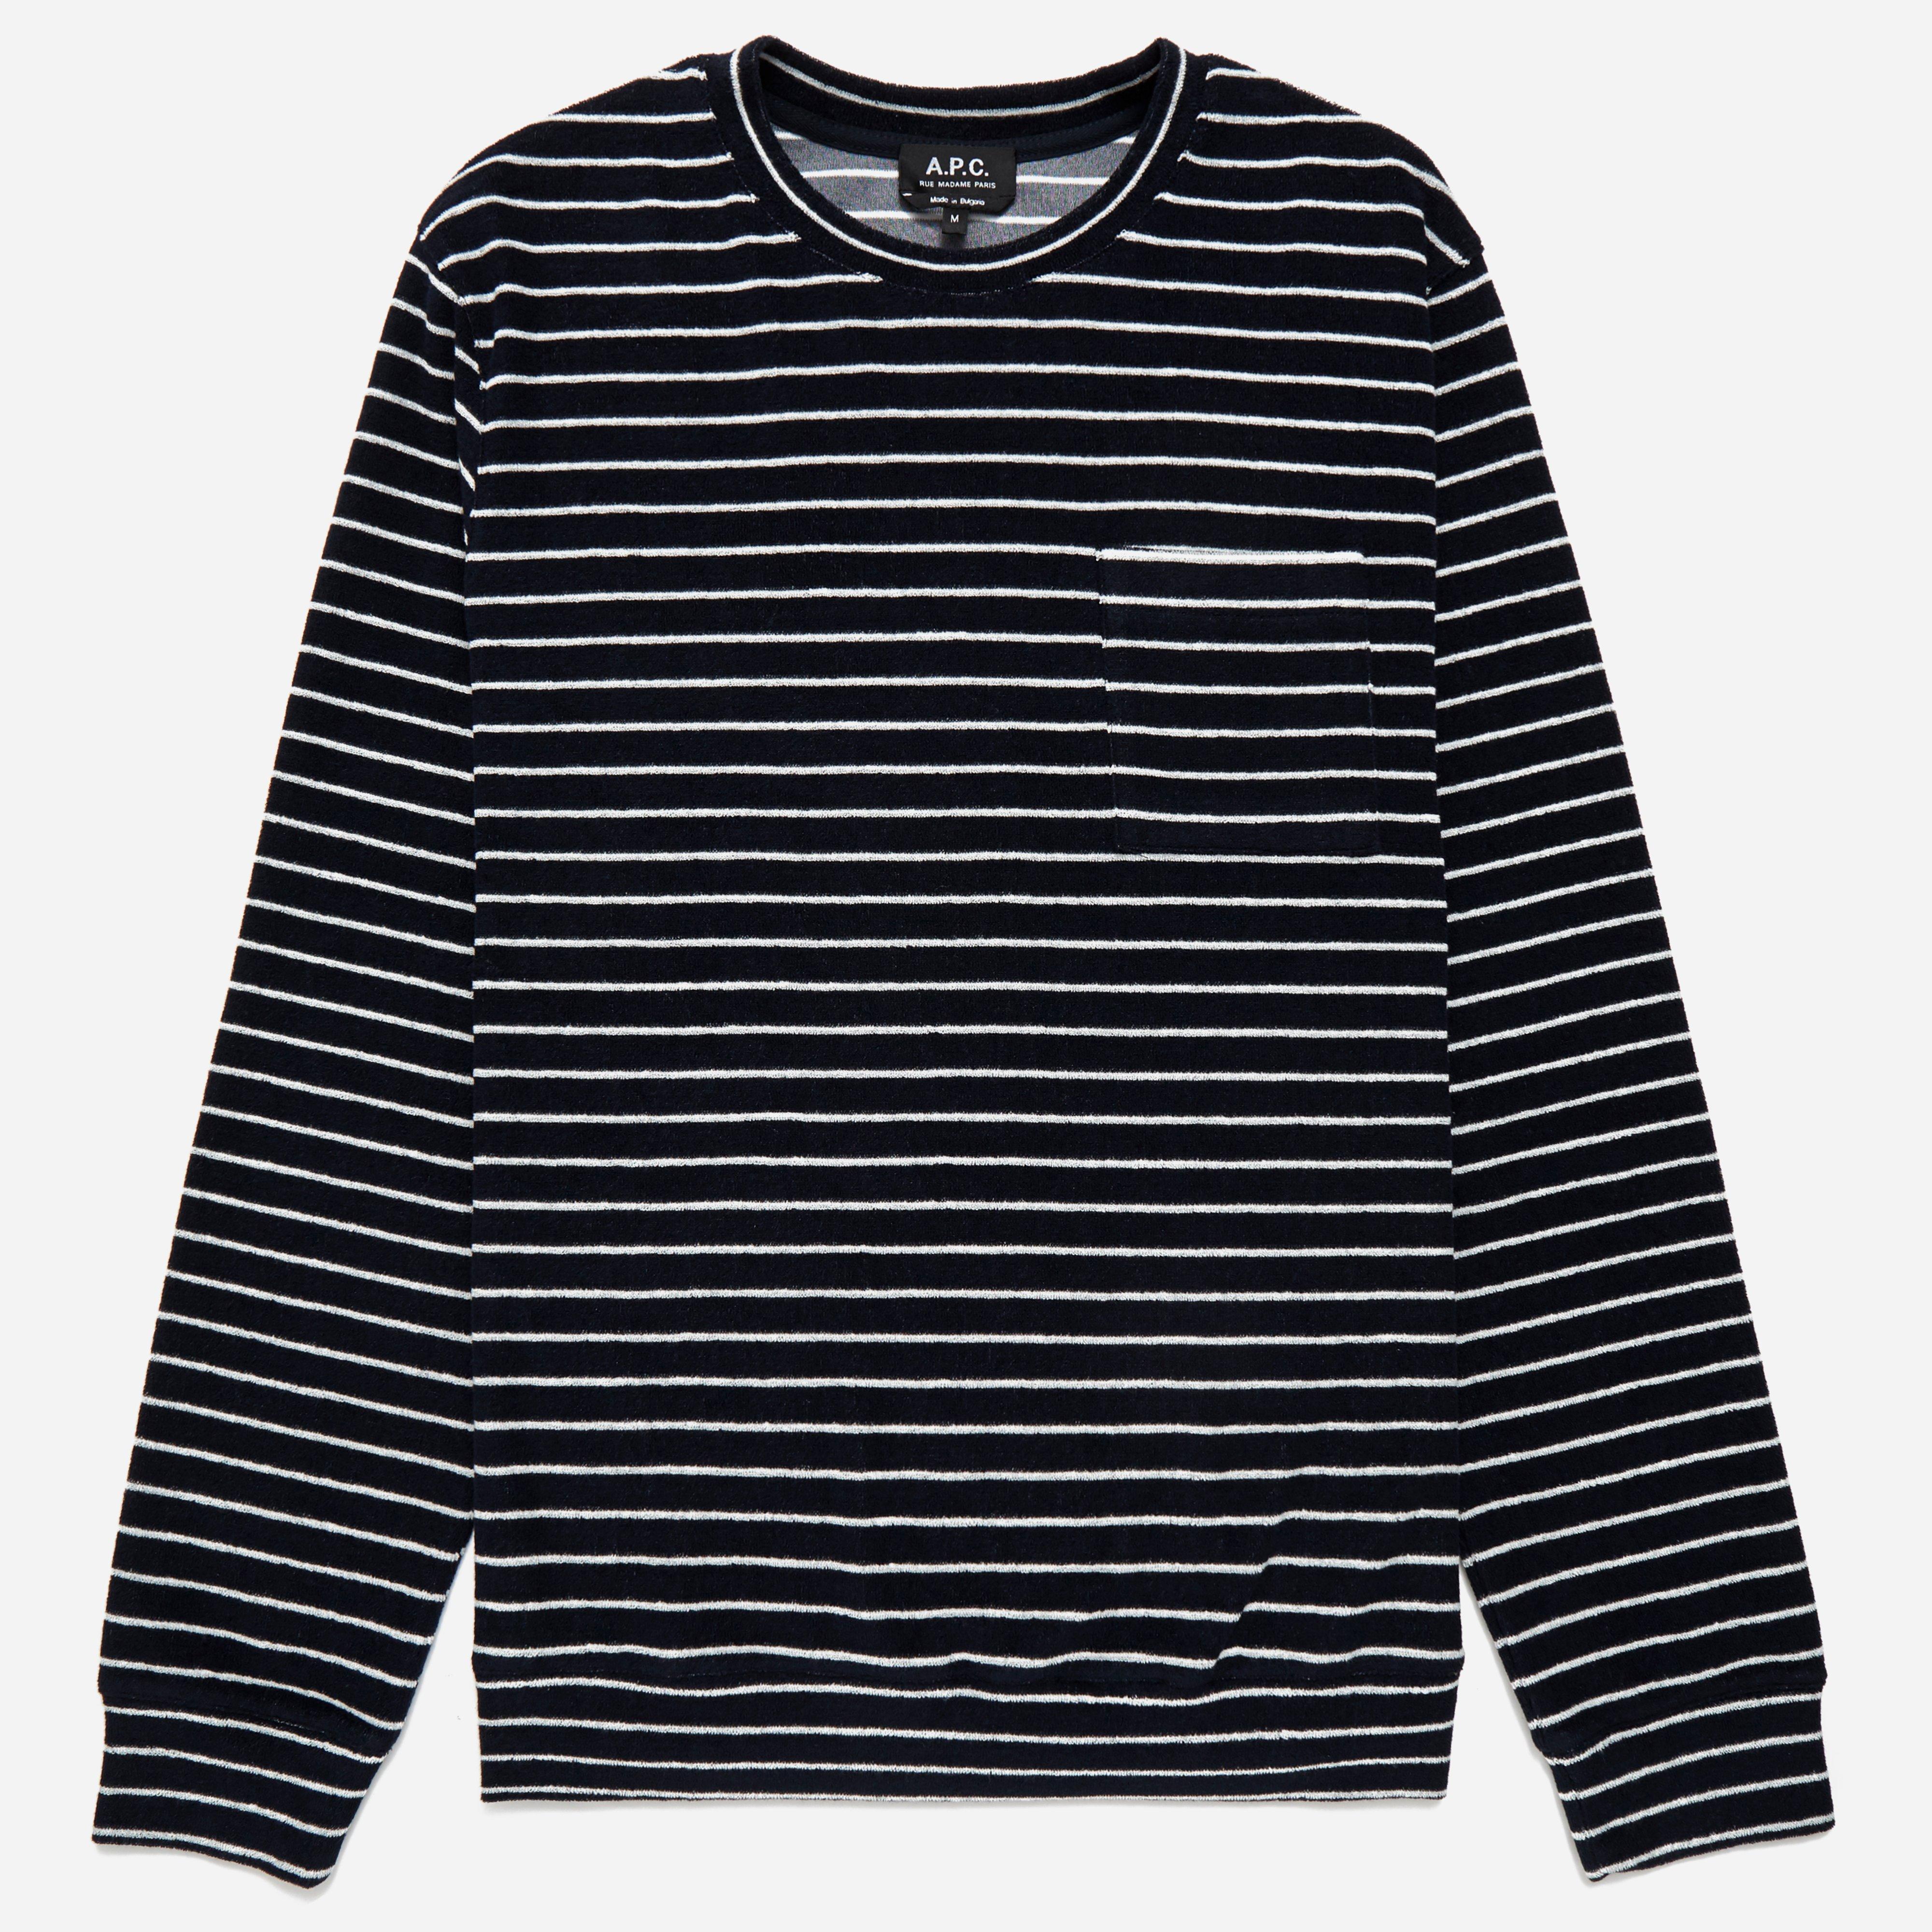 A.P.C Yogi Sweatshirt